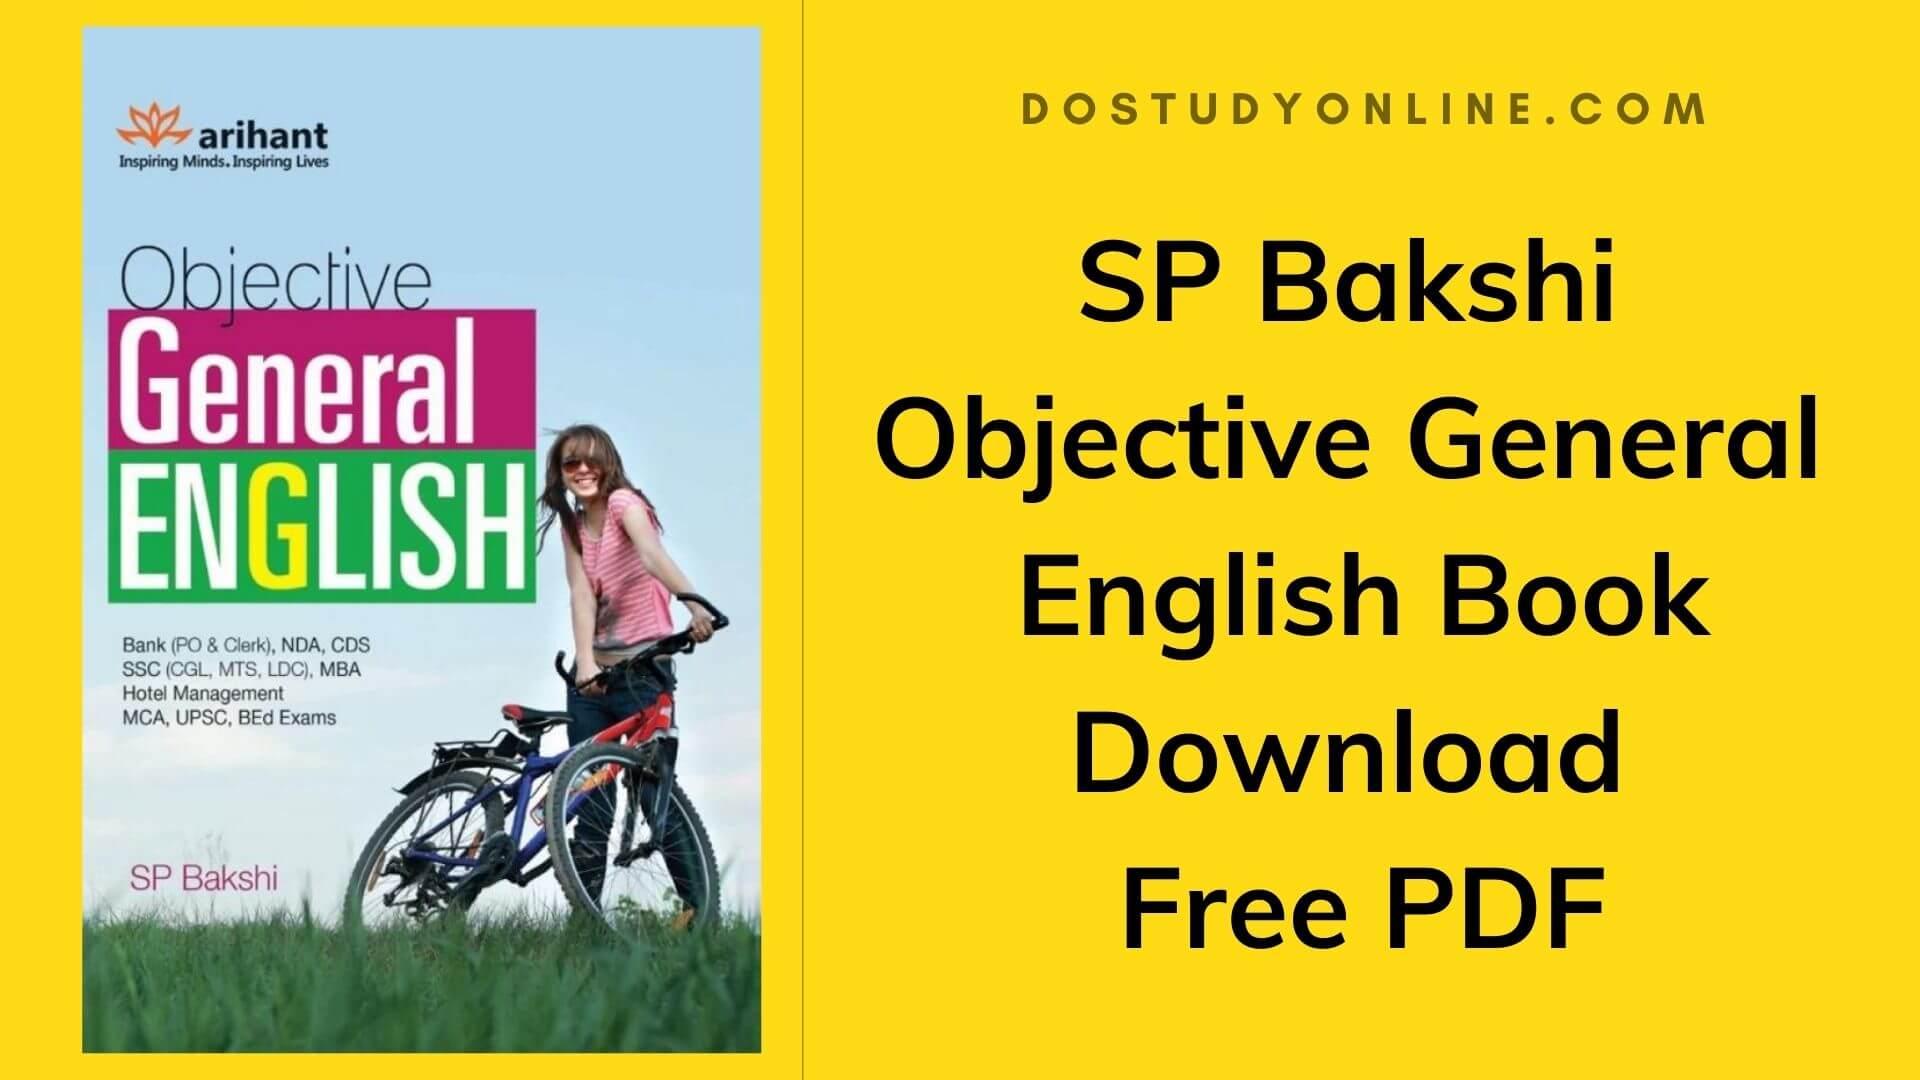 SP-Bakshi-Objective-General-English-Book-Download-Free-PDF